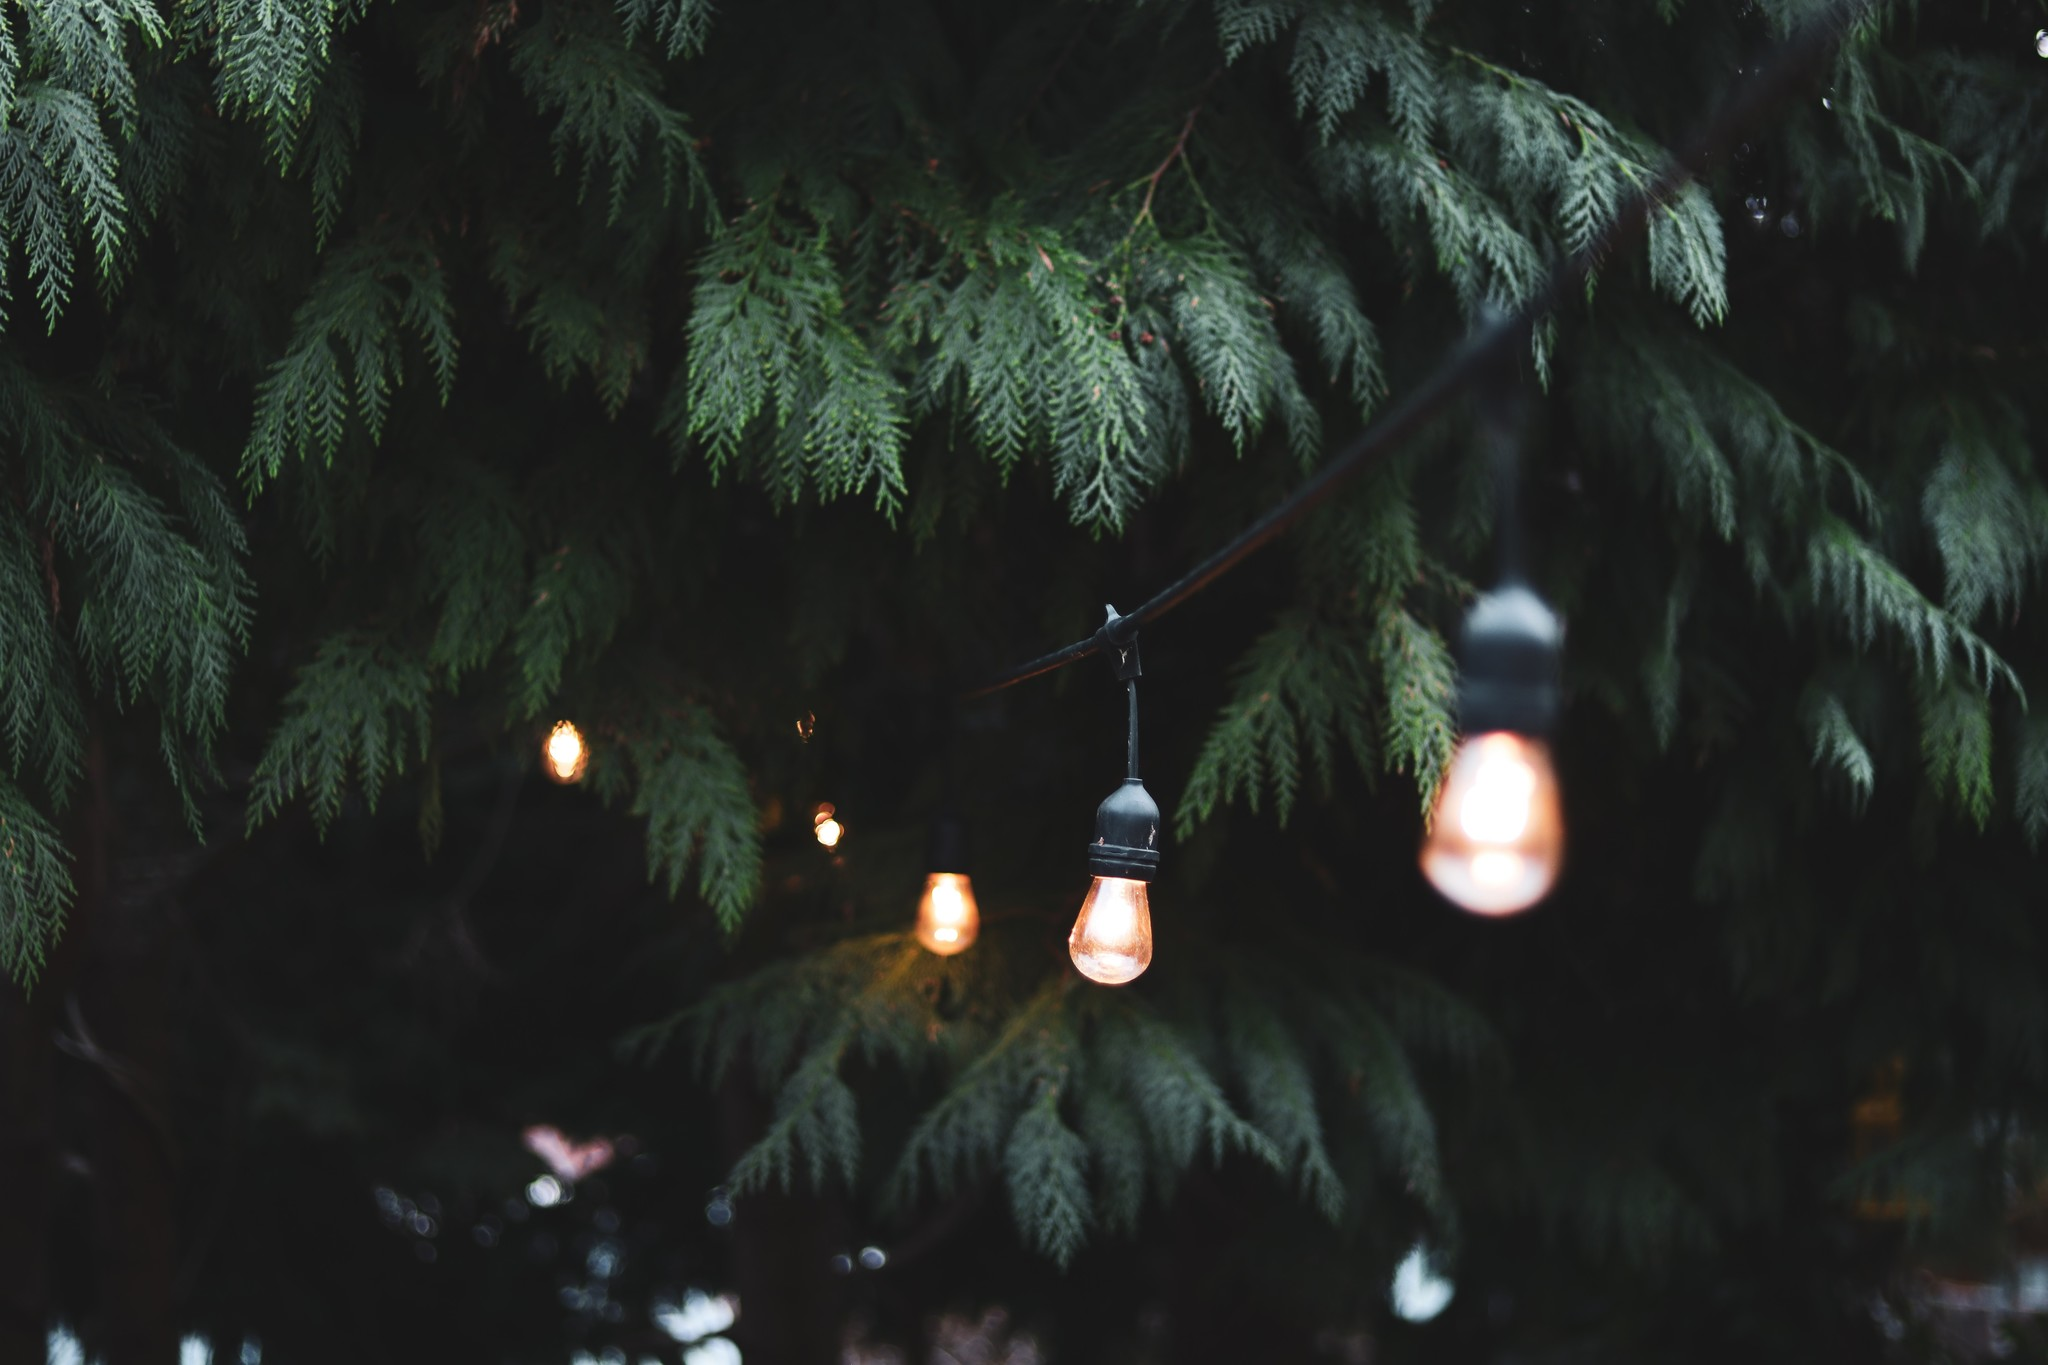 LED tuinverlichting: dezelfde gezellige sfeer als binnen